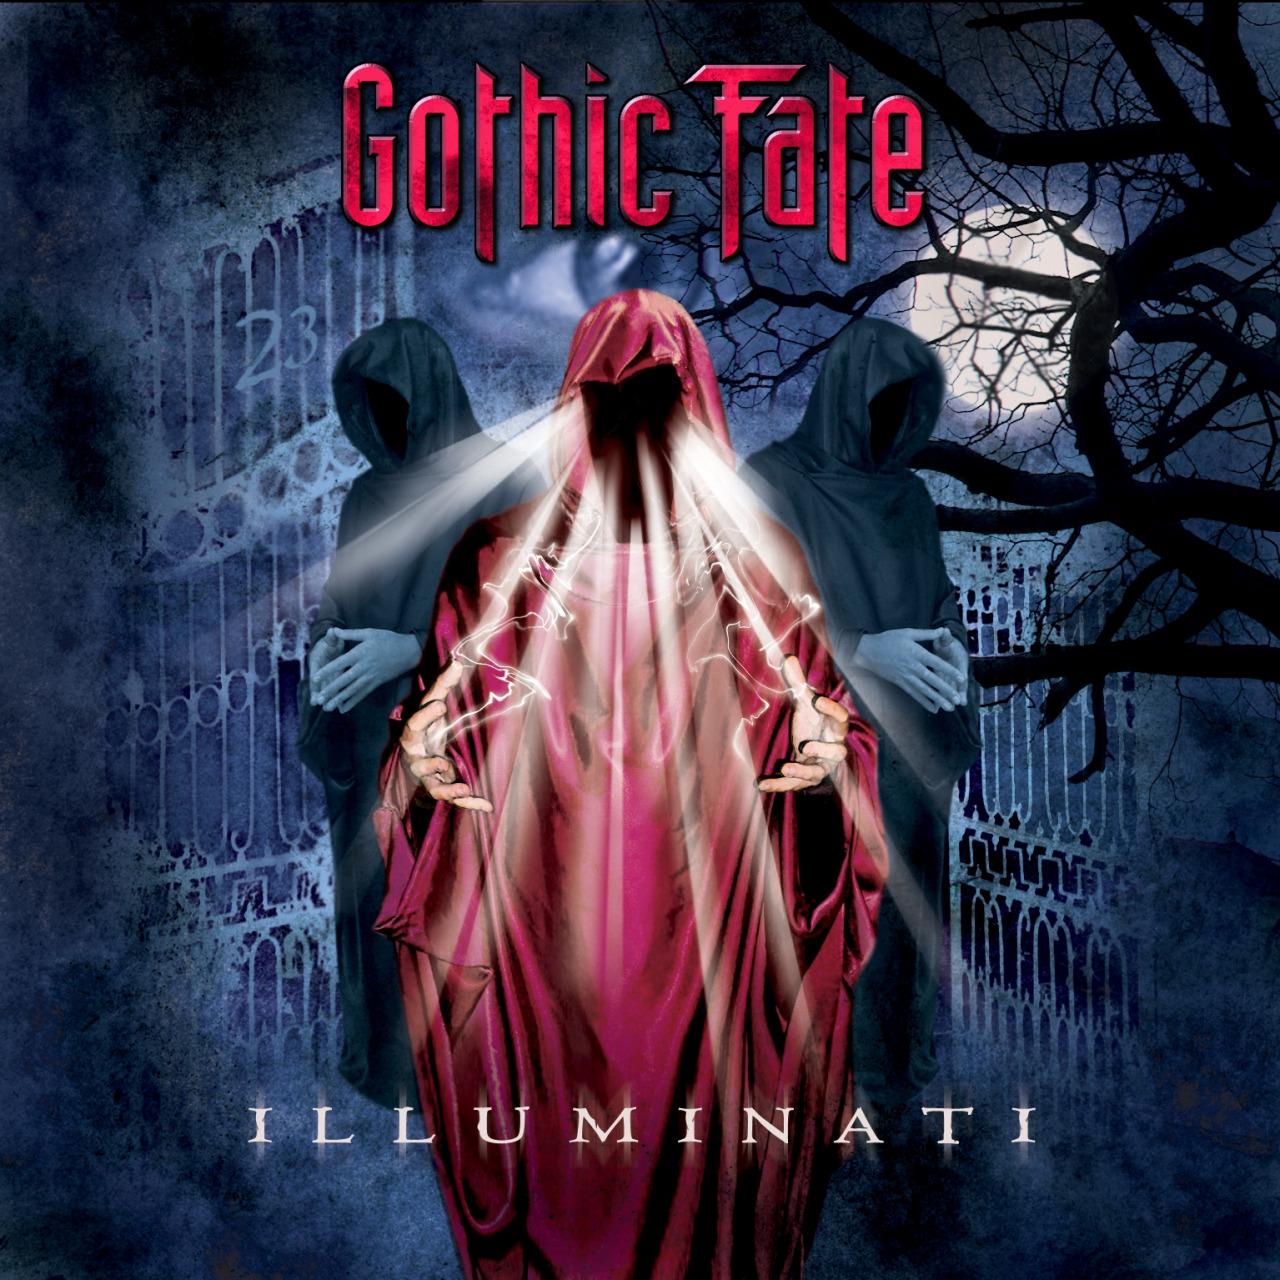 gothic-fate-illuminati-artwork